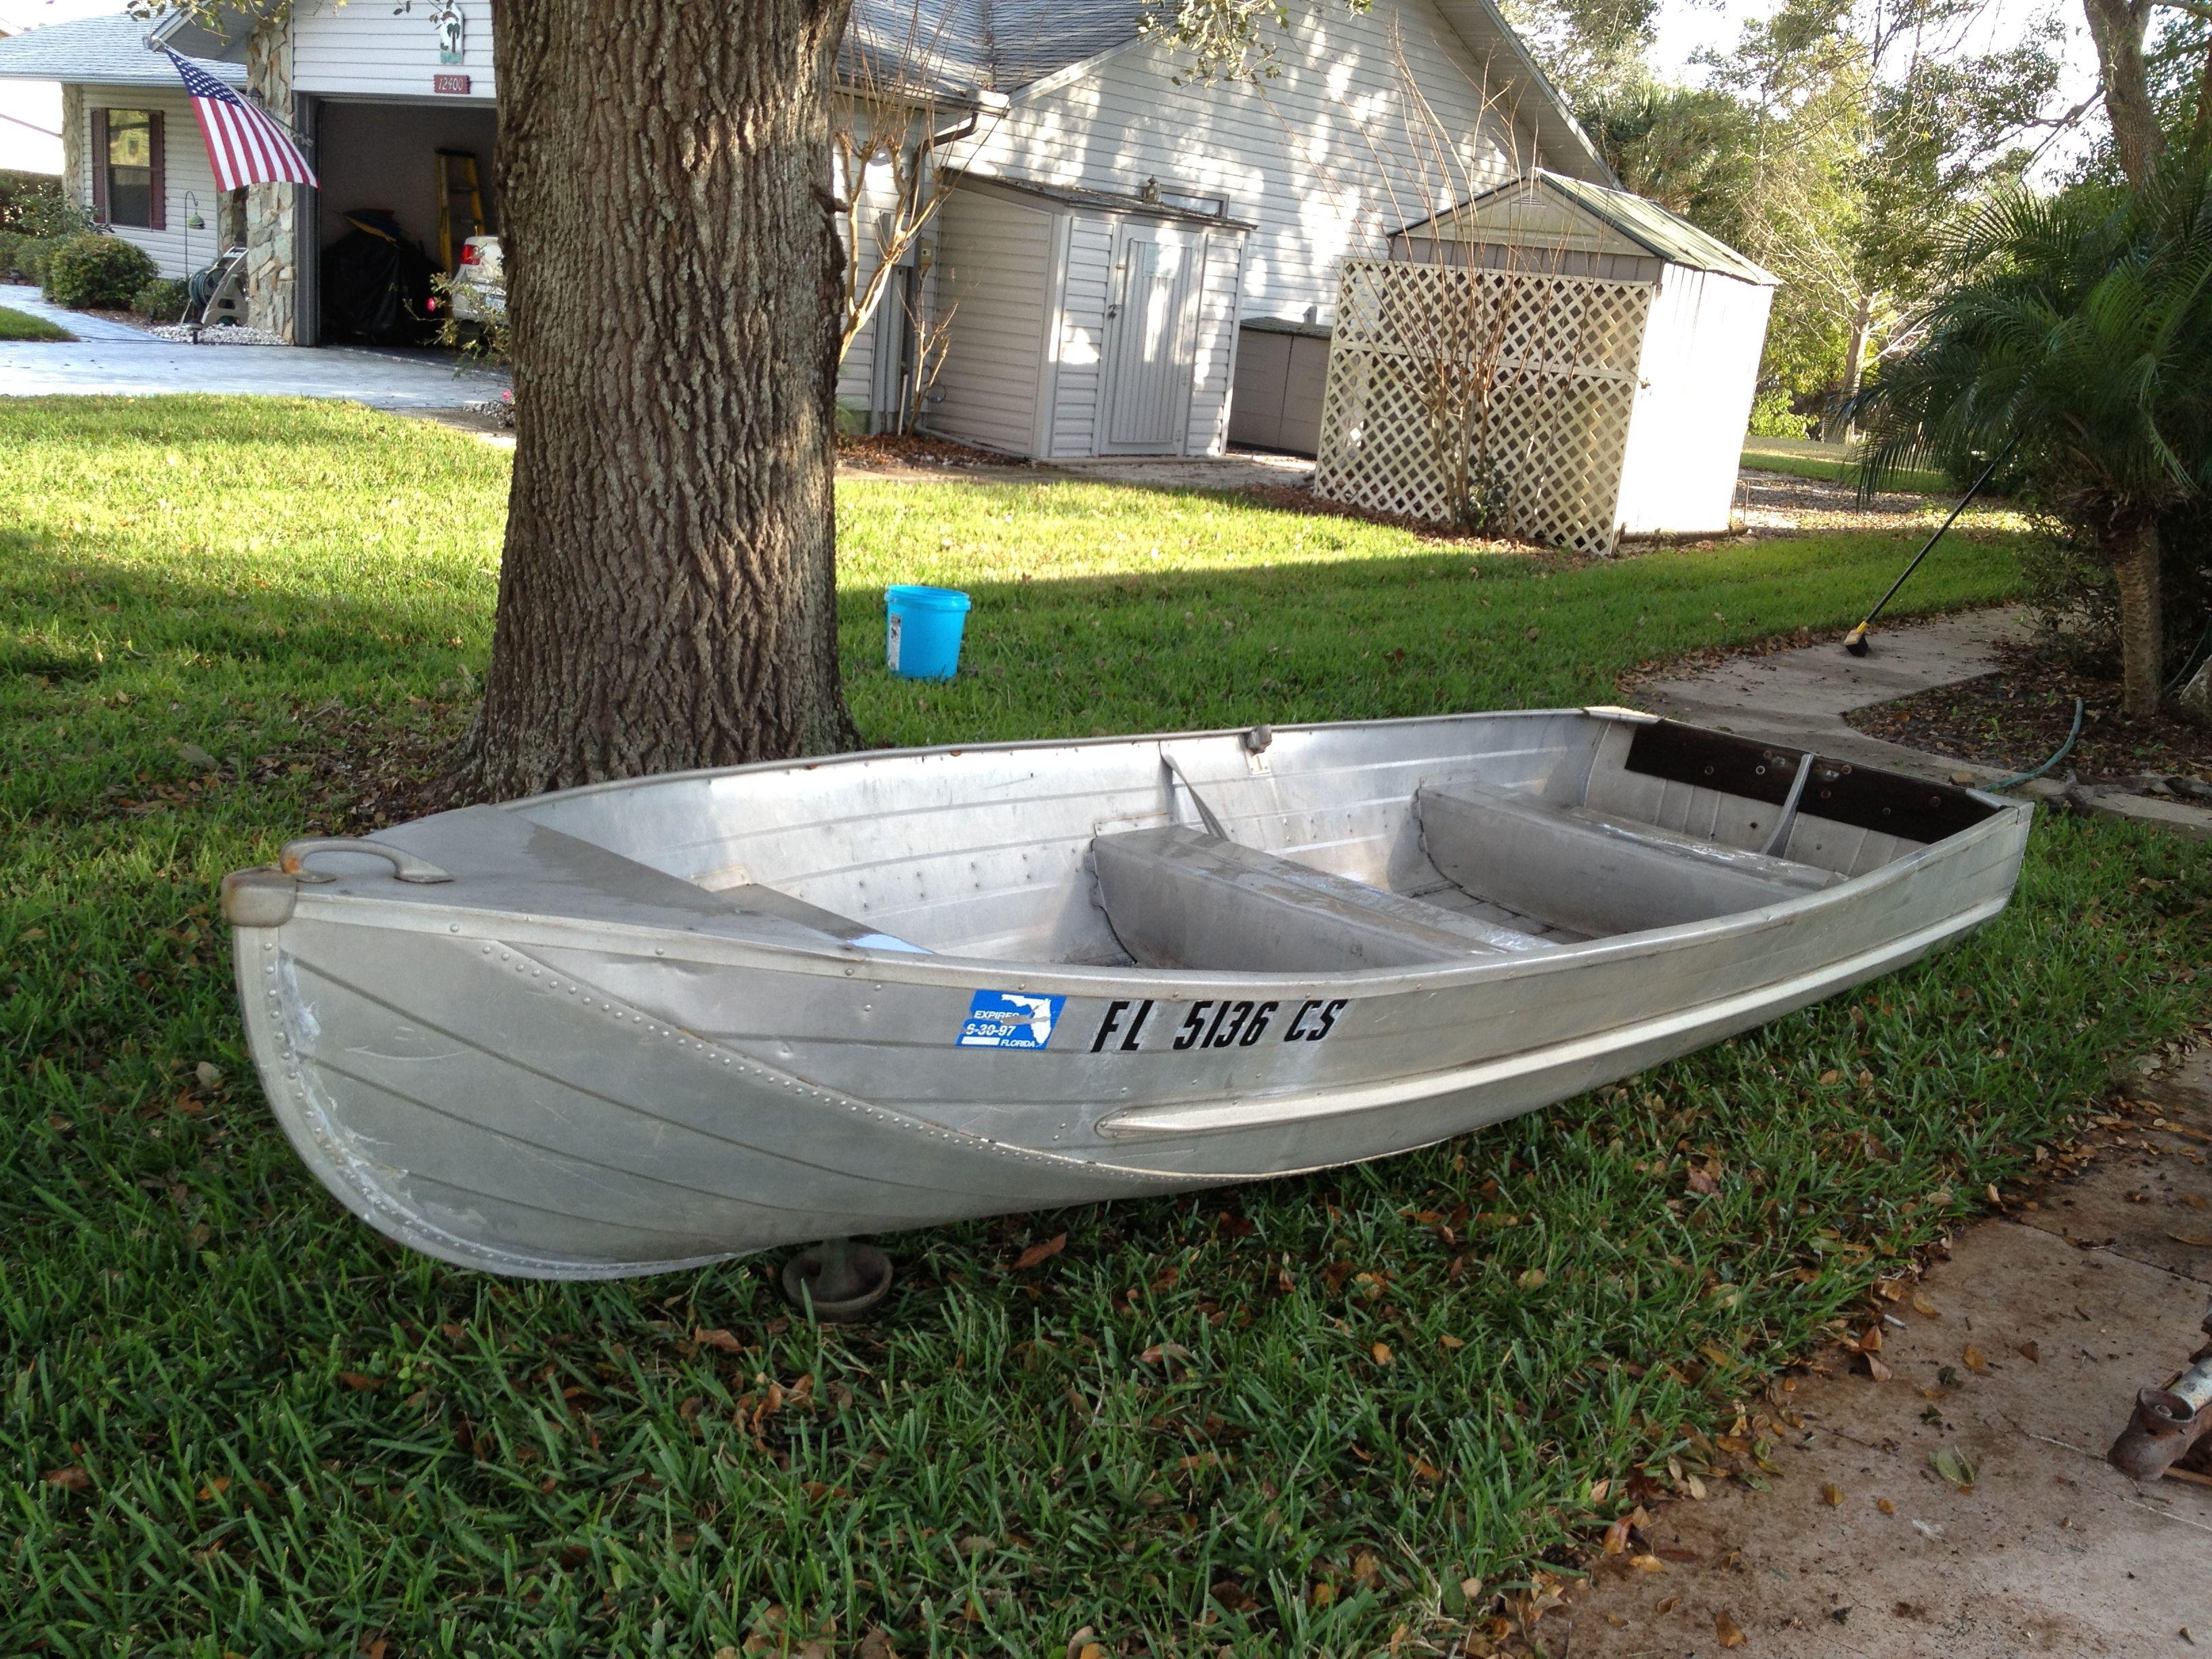 Nice polished 14 39 aluminum jon boat perfect for florida for Nice fishing boats